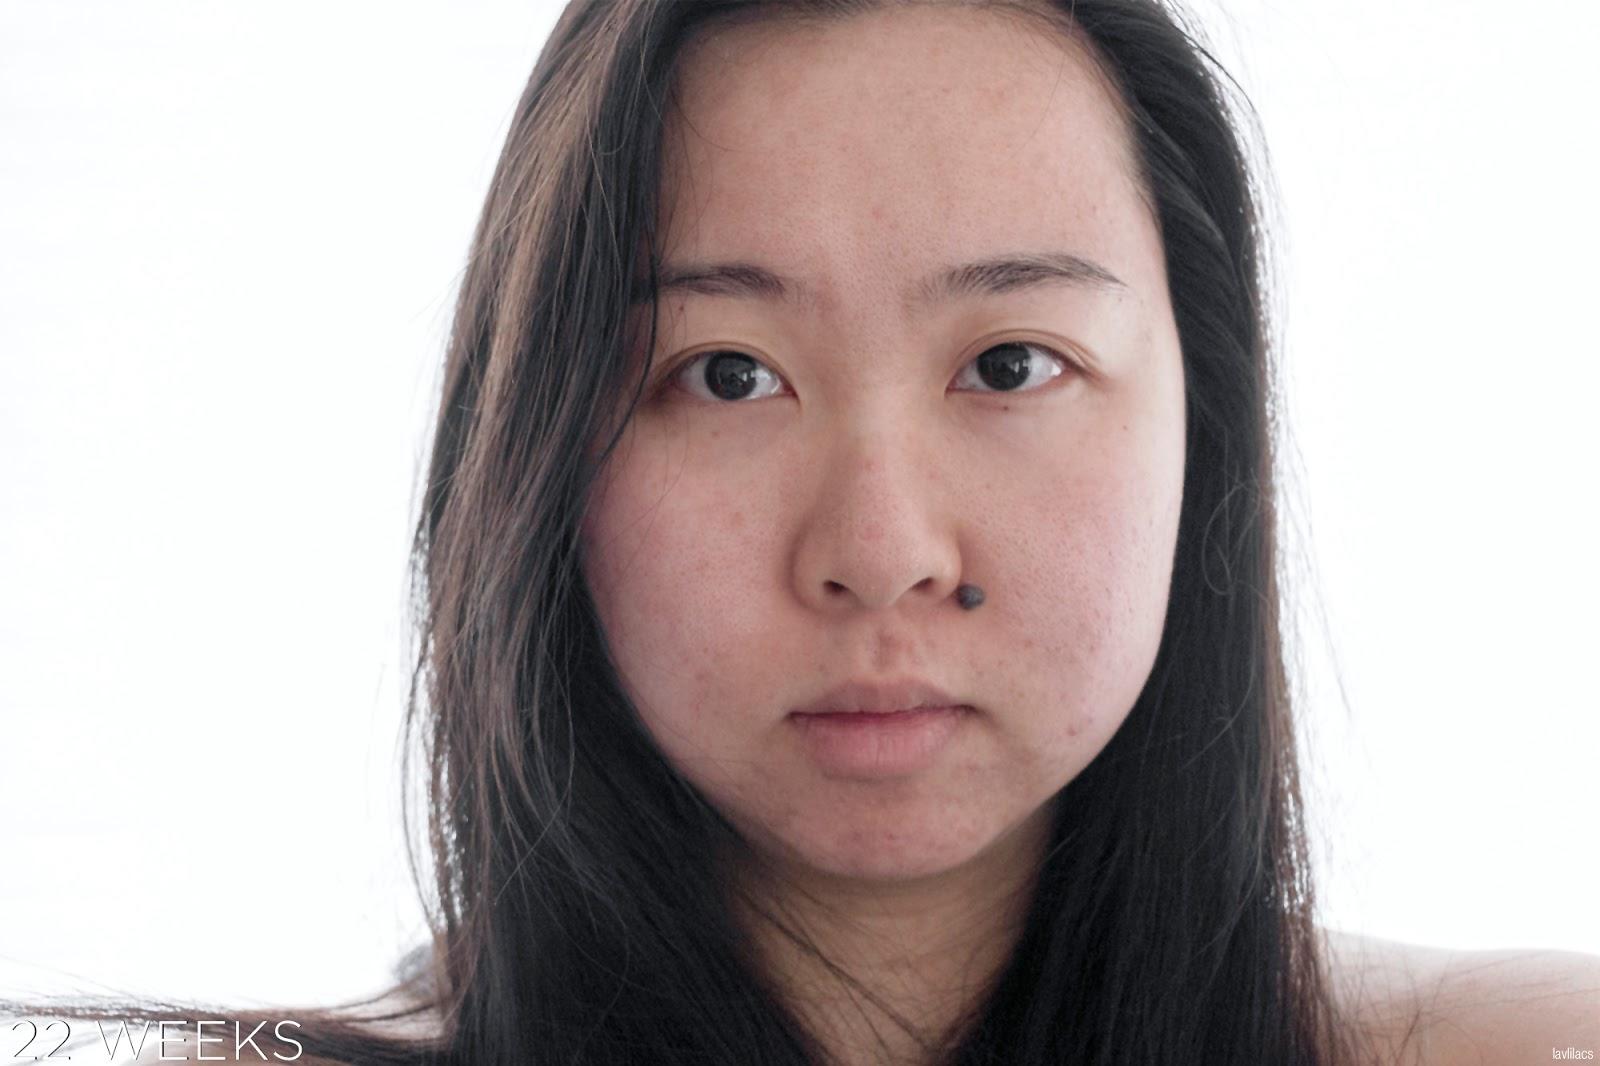 tria Hair Removal Laser Facial Hair 22 Weeks, 5 months